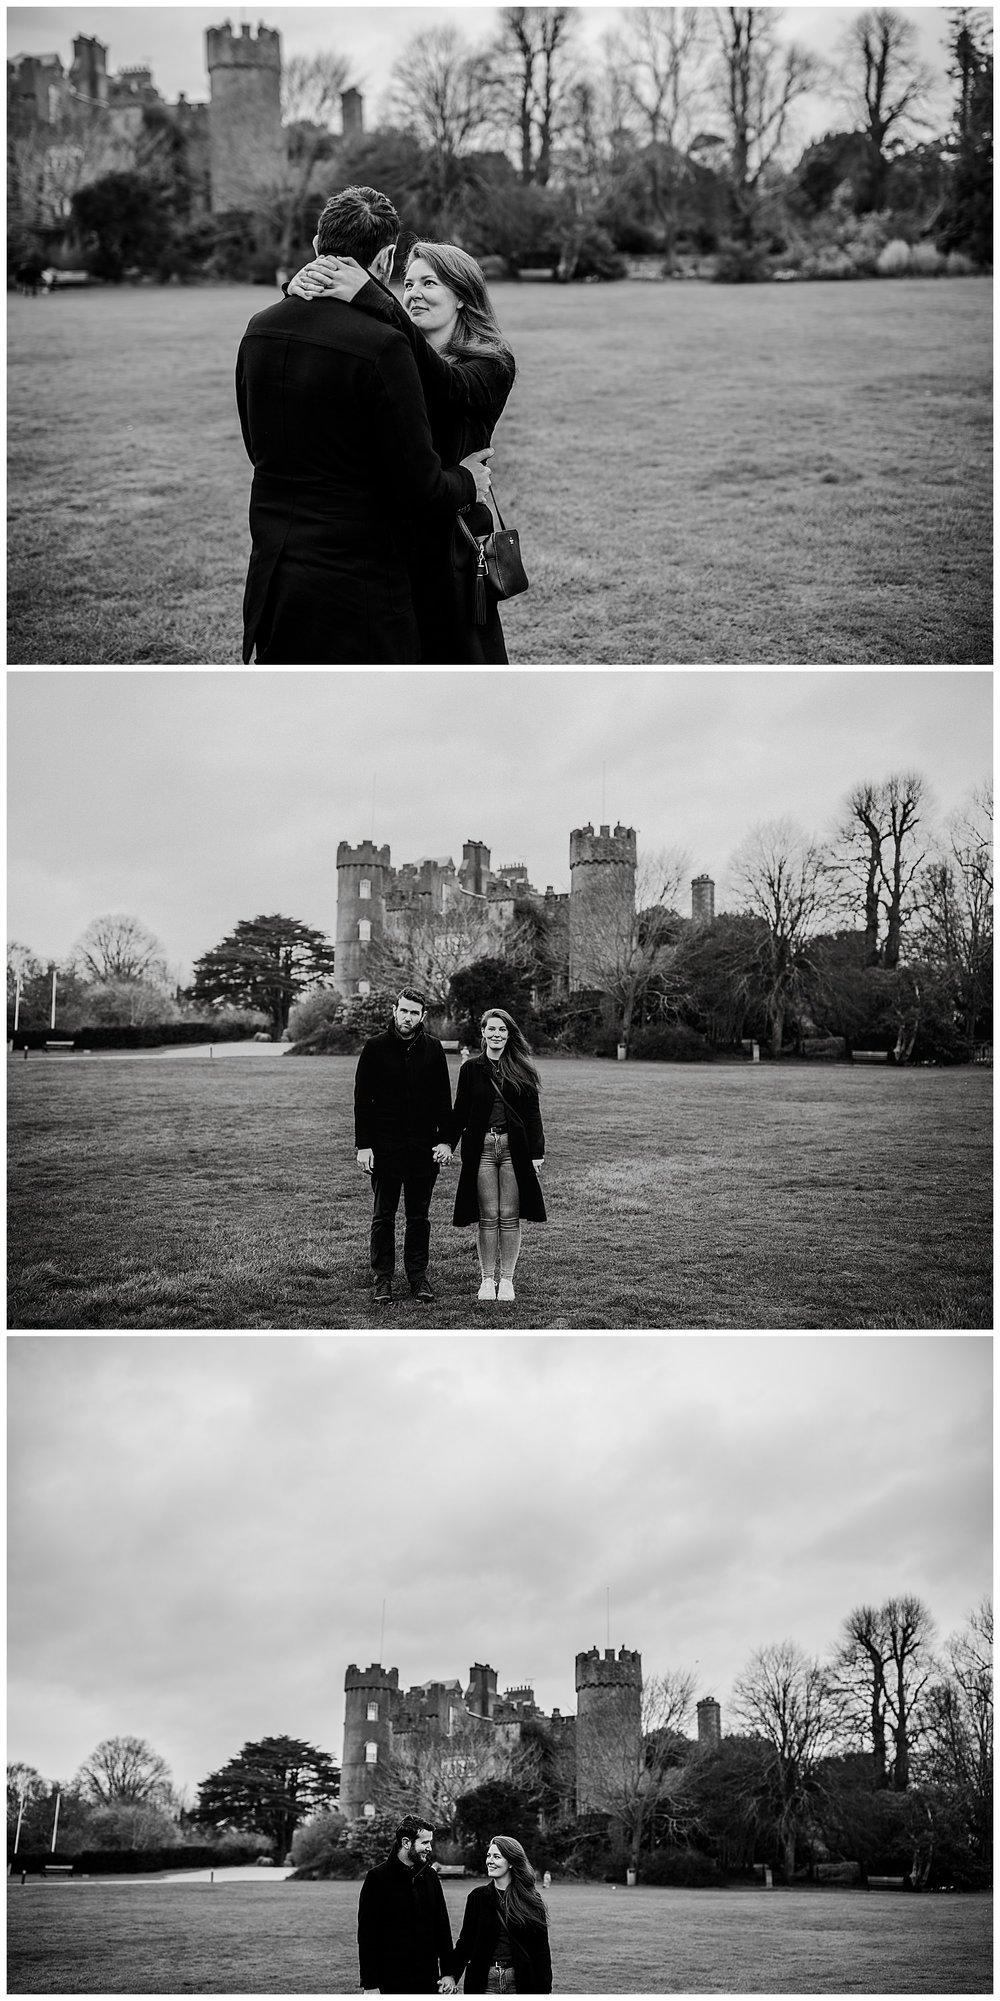 j+m_malahide_castle_engagement_session_wedding_photographer_ireland_livia_figueiredo_3.jpg